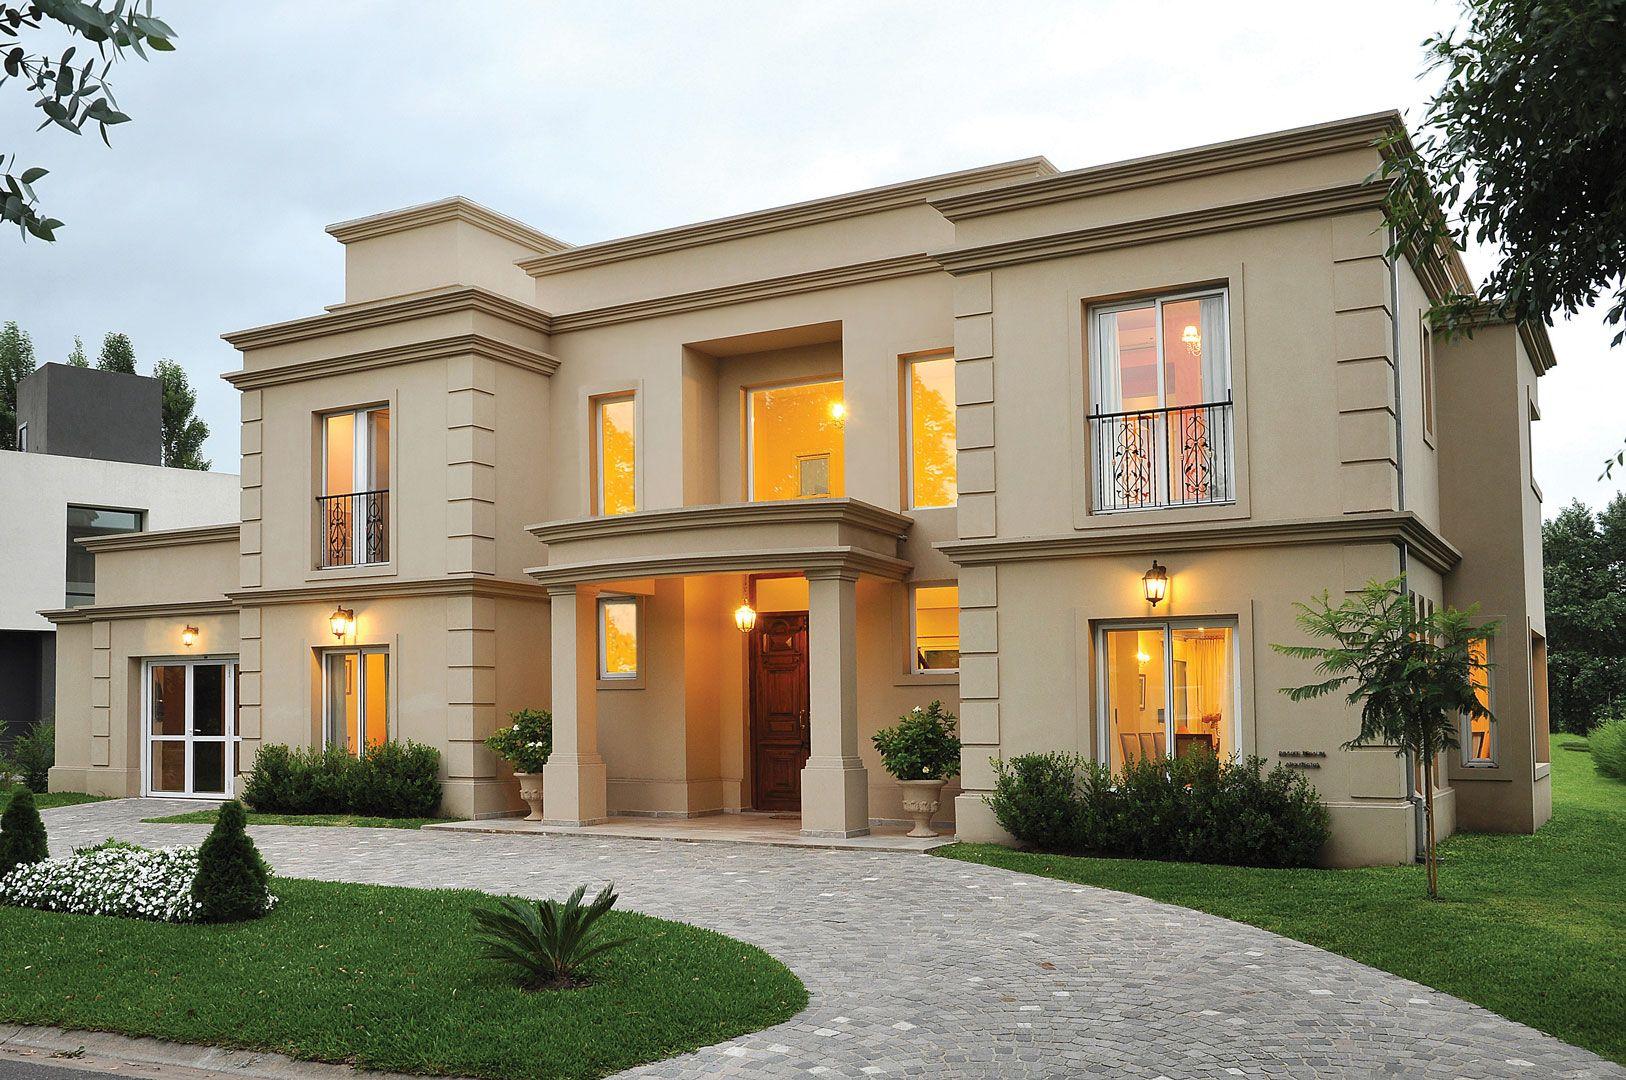 Galeria fotos pavloff regalini asociados estudio de arquitectura arquitectos casa - Casas clasicas modernas ...